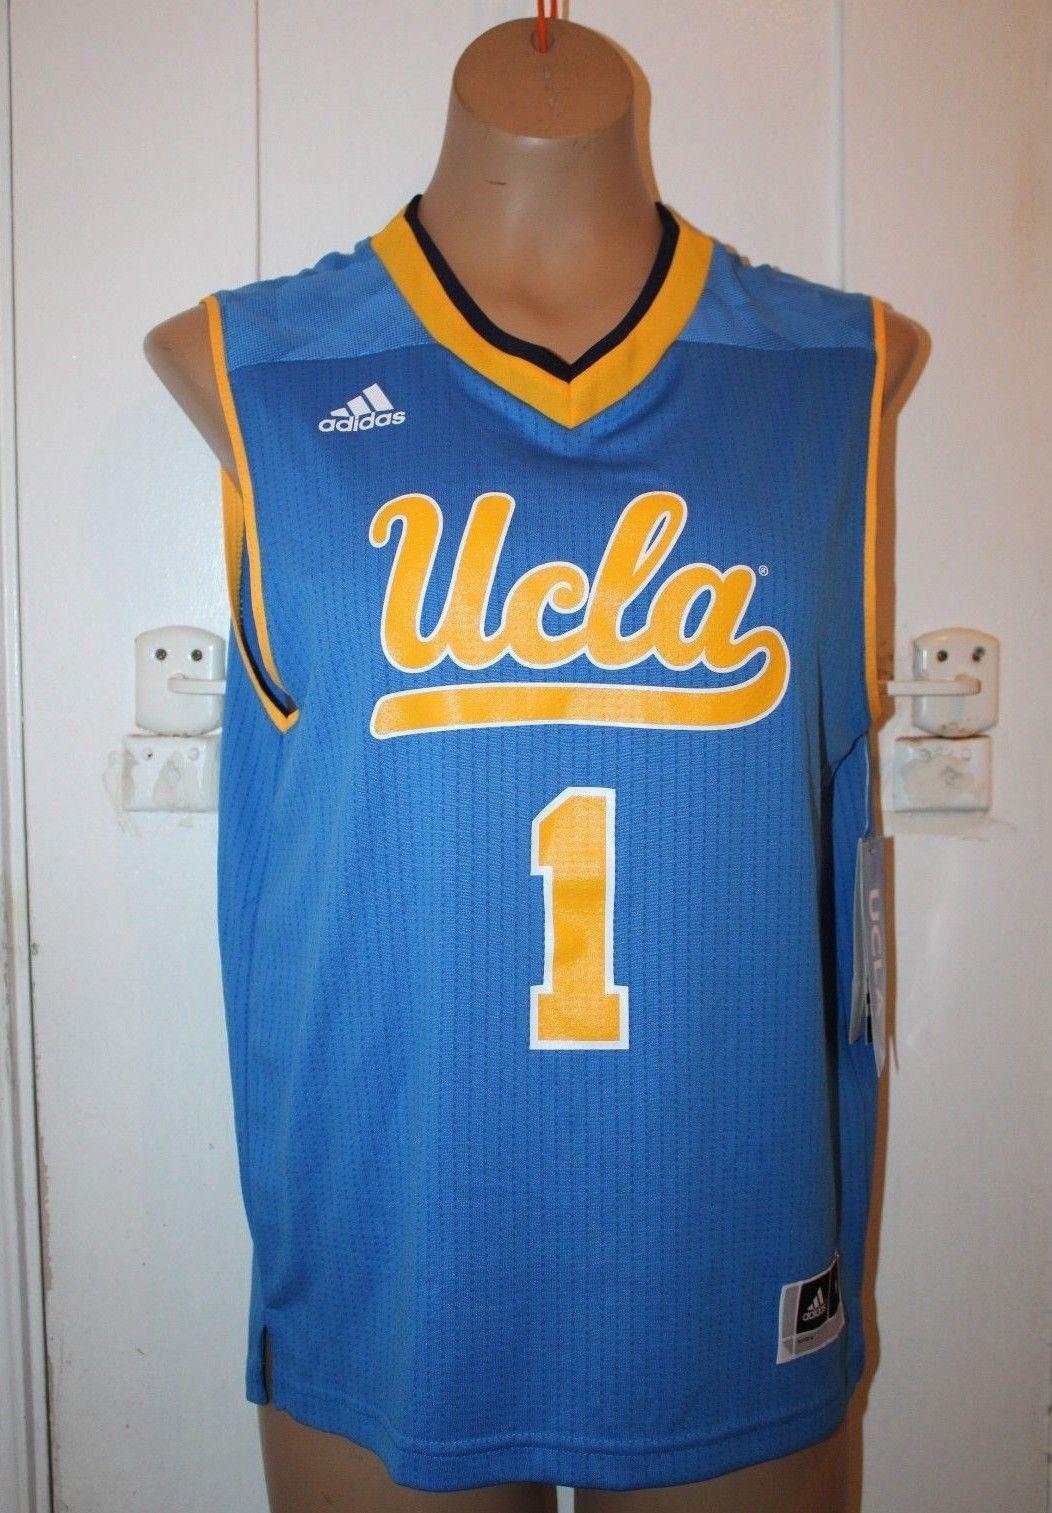 ADIDAS NCAA UCLA Bruins Youth Medium (10-12)  1 Blue Basketball Jersey 072ebff4c